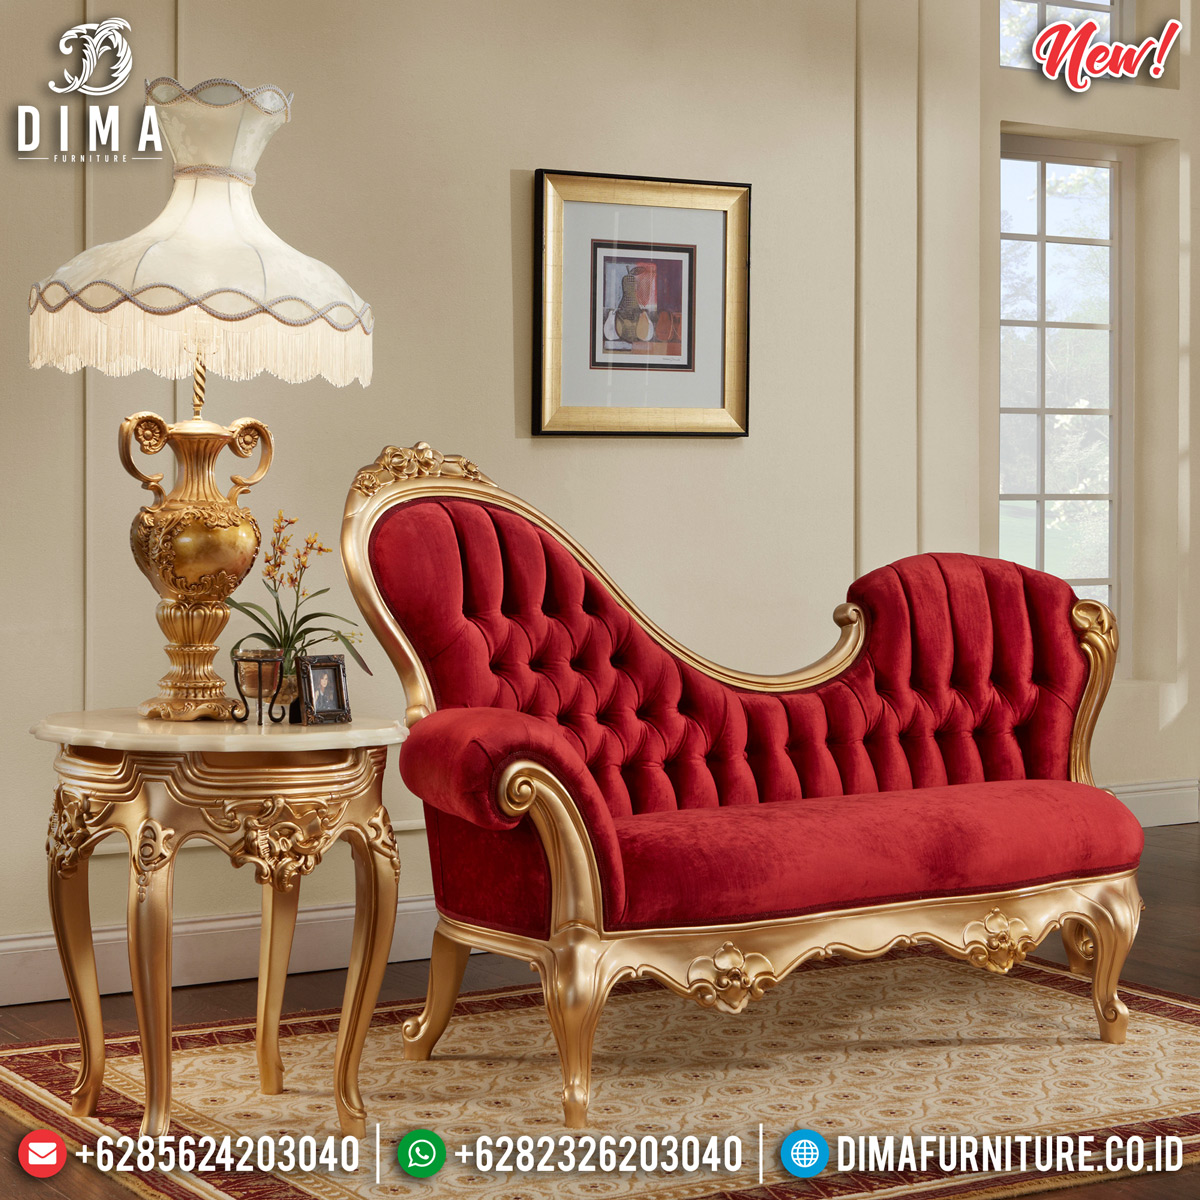 Model Sofa Santai Mewah Ukiran Jepara Desain Glamorous Interior Design Inspiring TTJ-0811